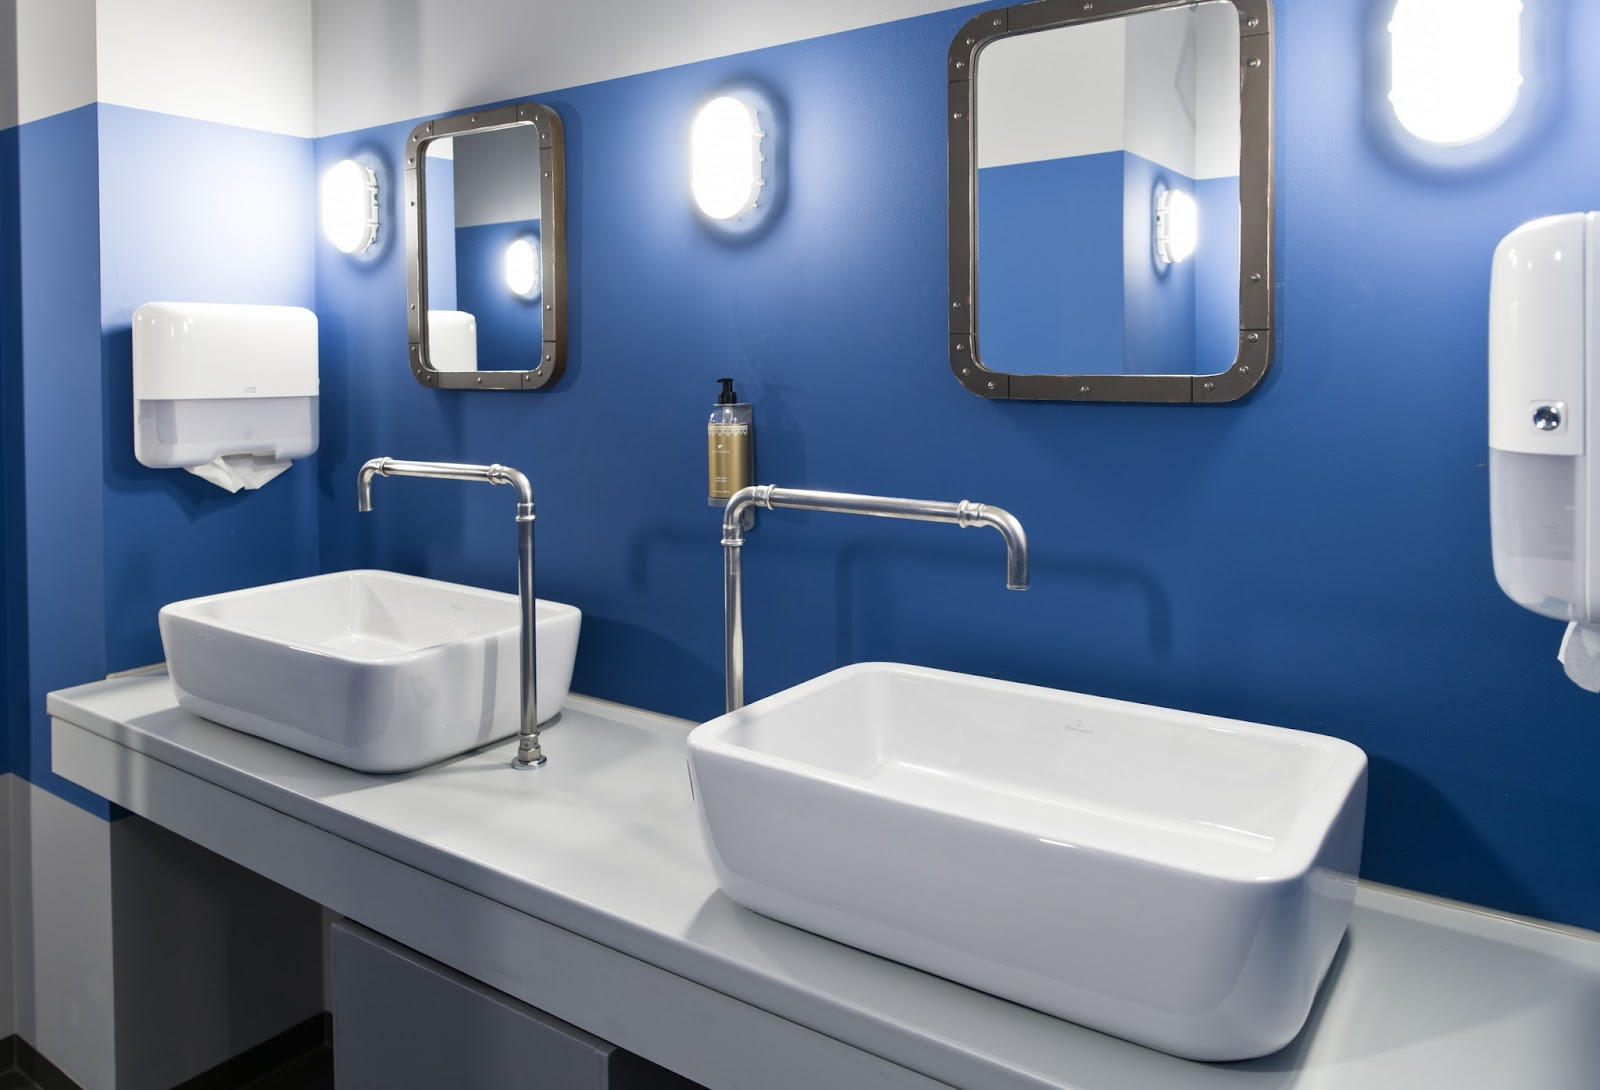 lavabo restaurante lavabo de bao original lavbo apoyo. Black Bedroom Furniture Sets. Home Design Ideas